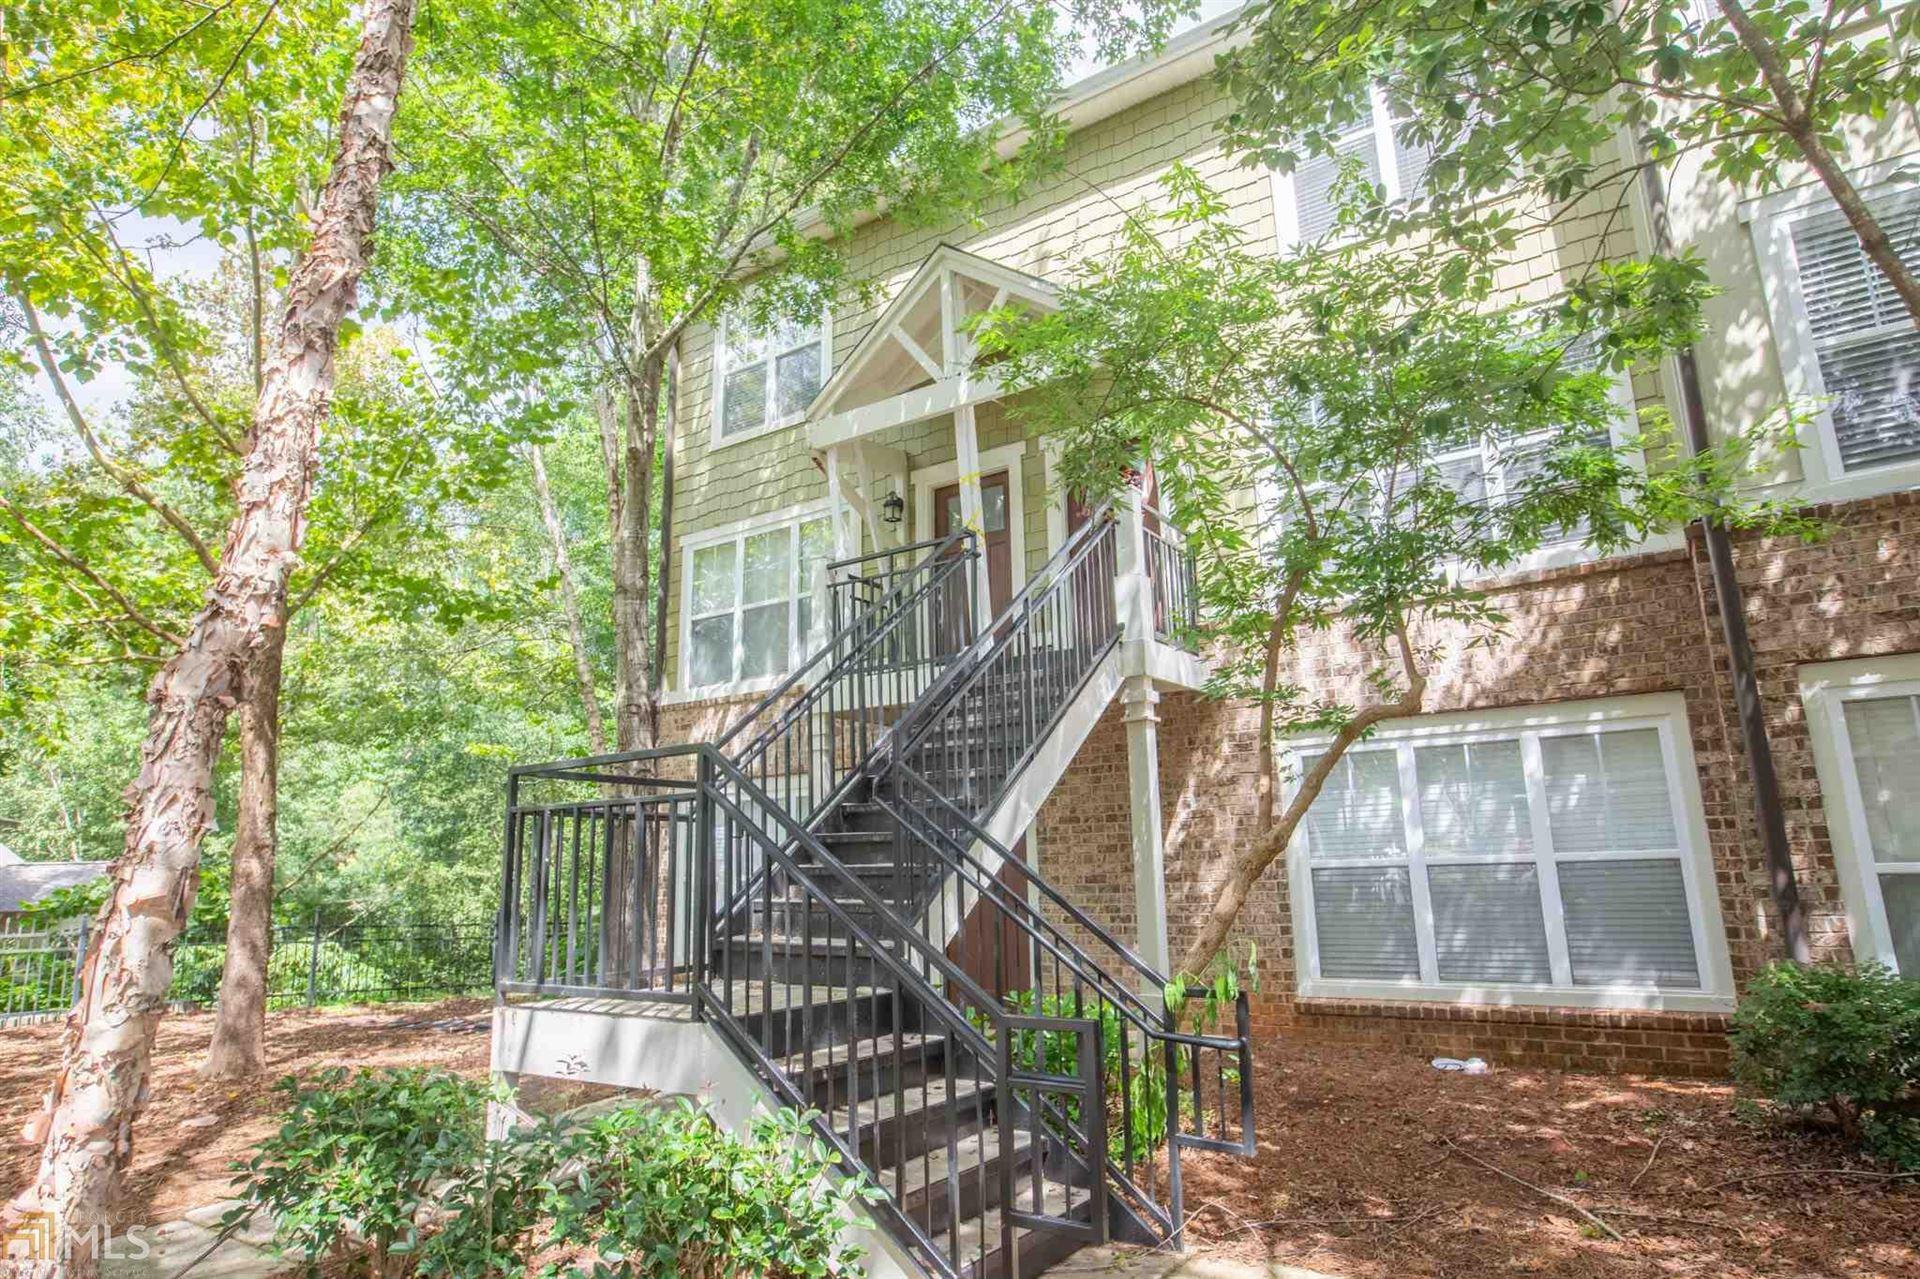 490 Barnett Shoals Rd, Athens, GA 30605 - MLS#: 8848983